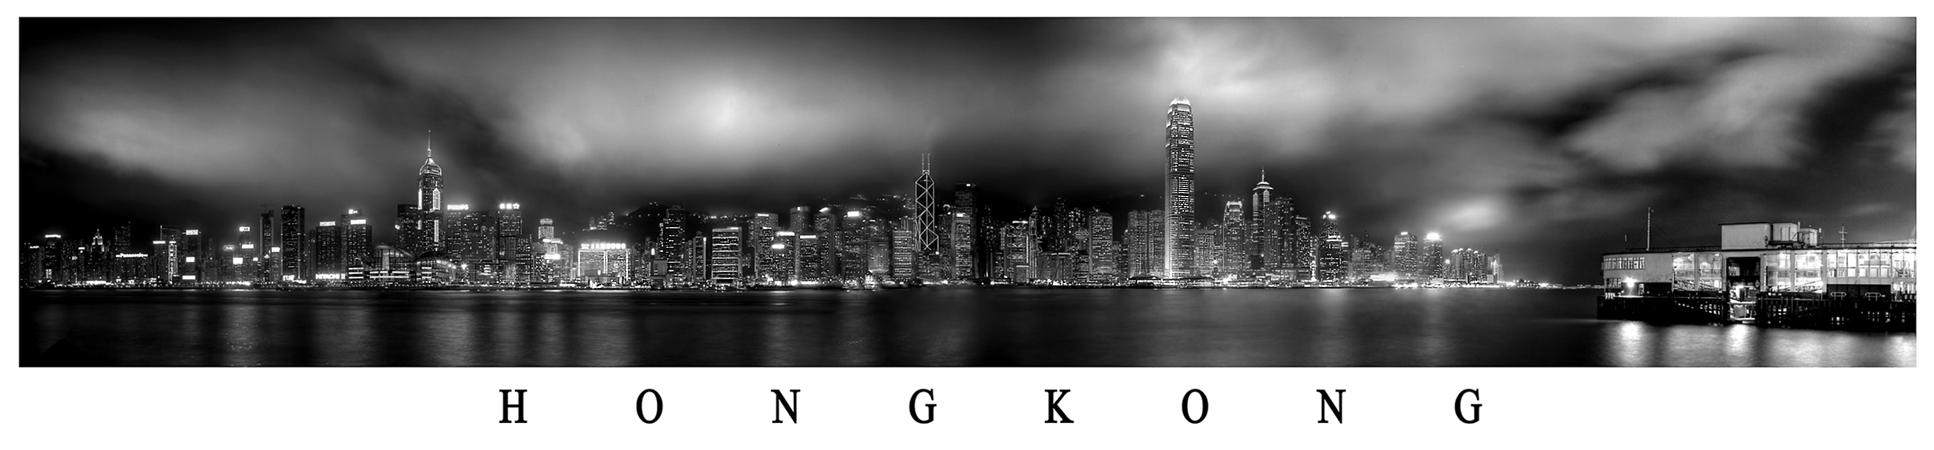 Hong Kong - Skyline (reload)